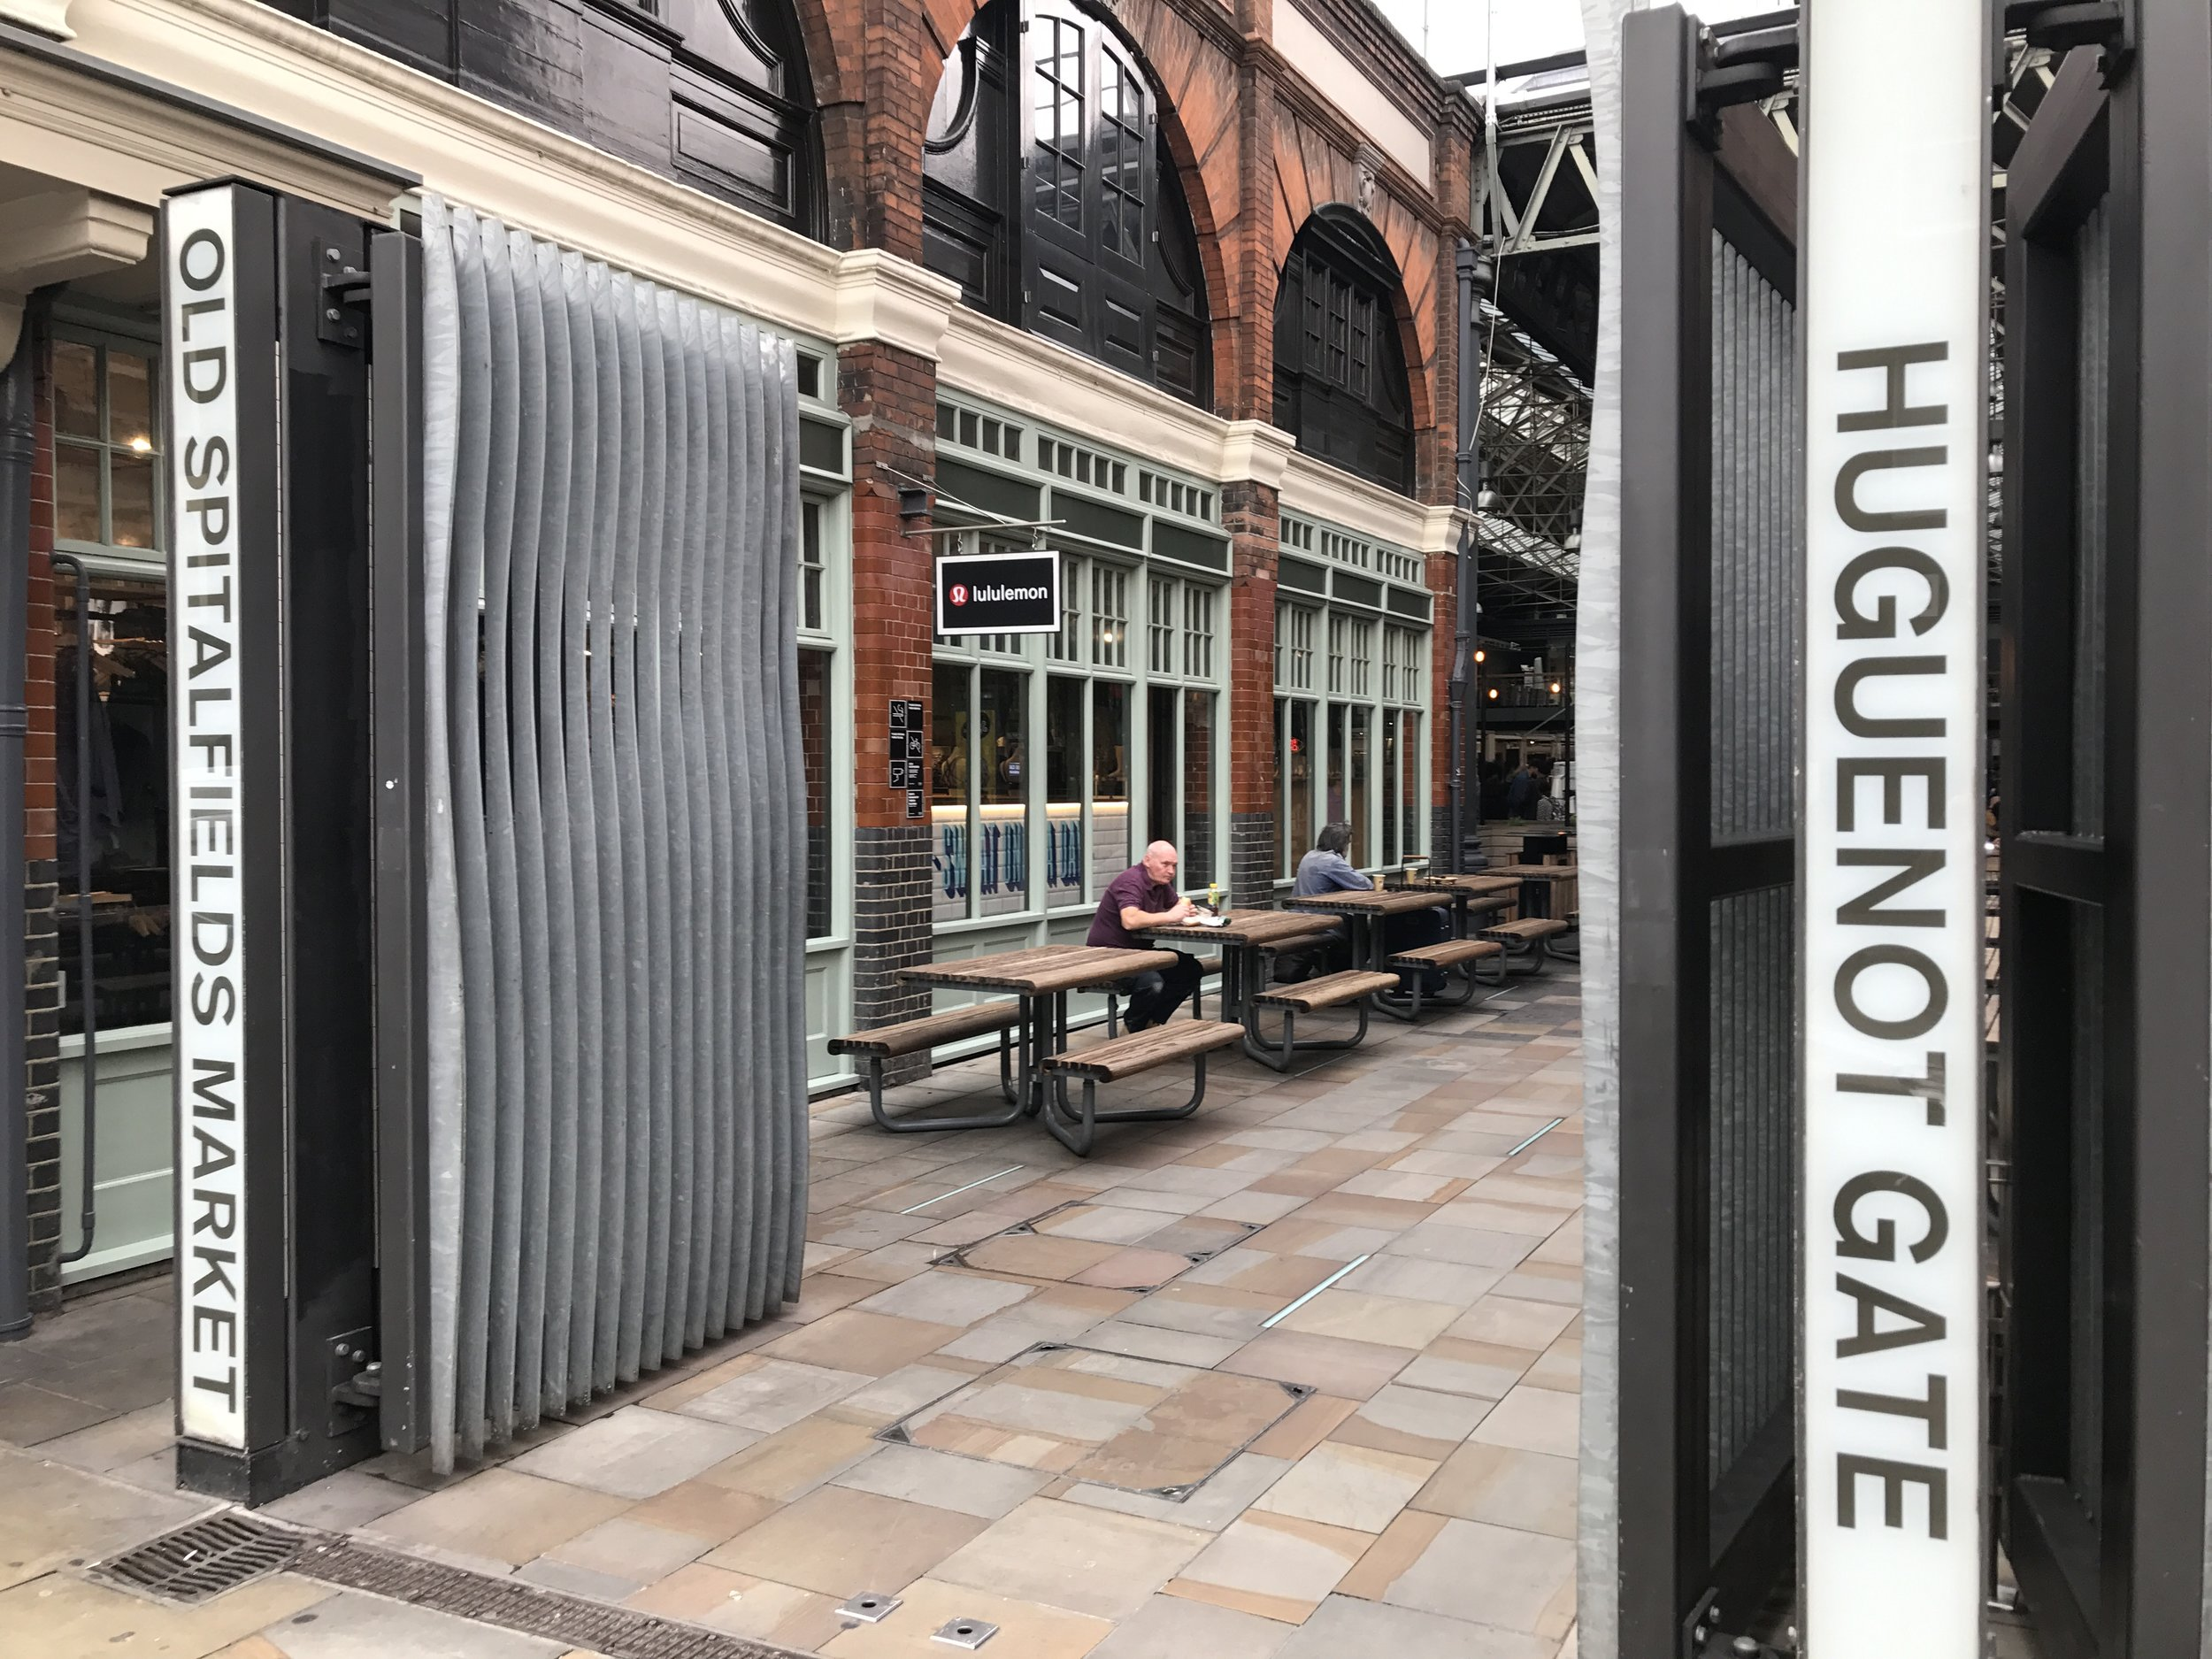 East London – Old Spitalfields Market Huguenot Gate